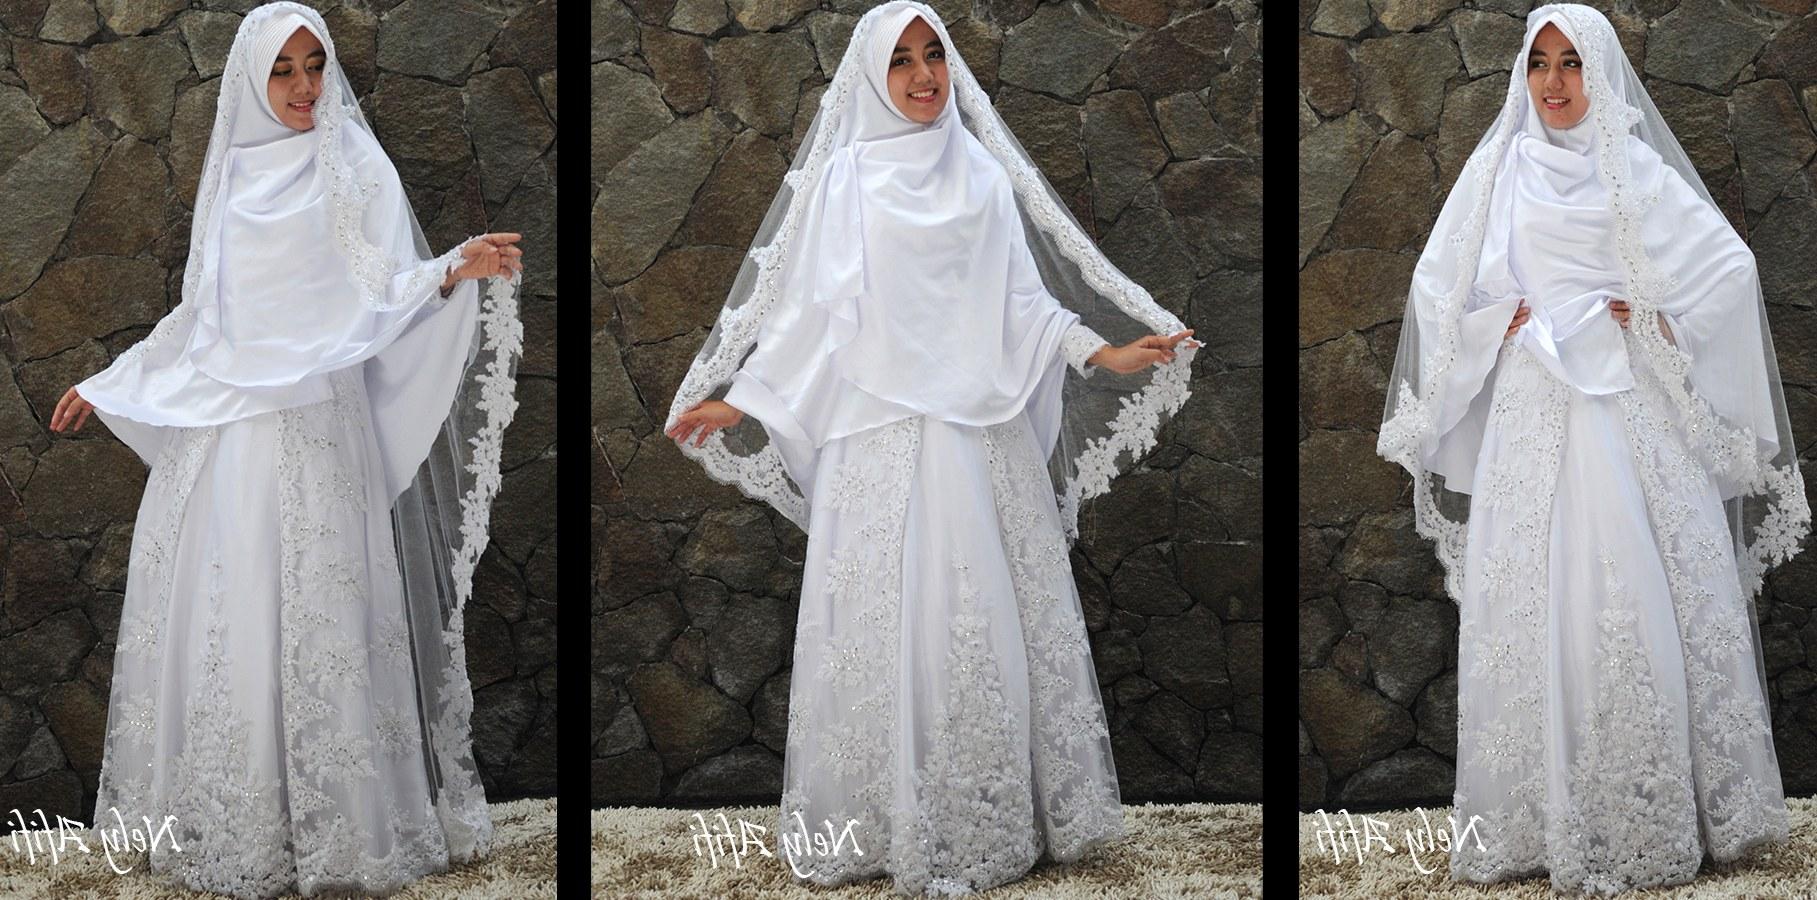 Bentuk Gaun Pernikahan Muslimah Syar'i Ffdn Baju Pengantin Muslimah Syar I Inspirasi Pernikahan